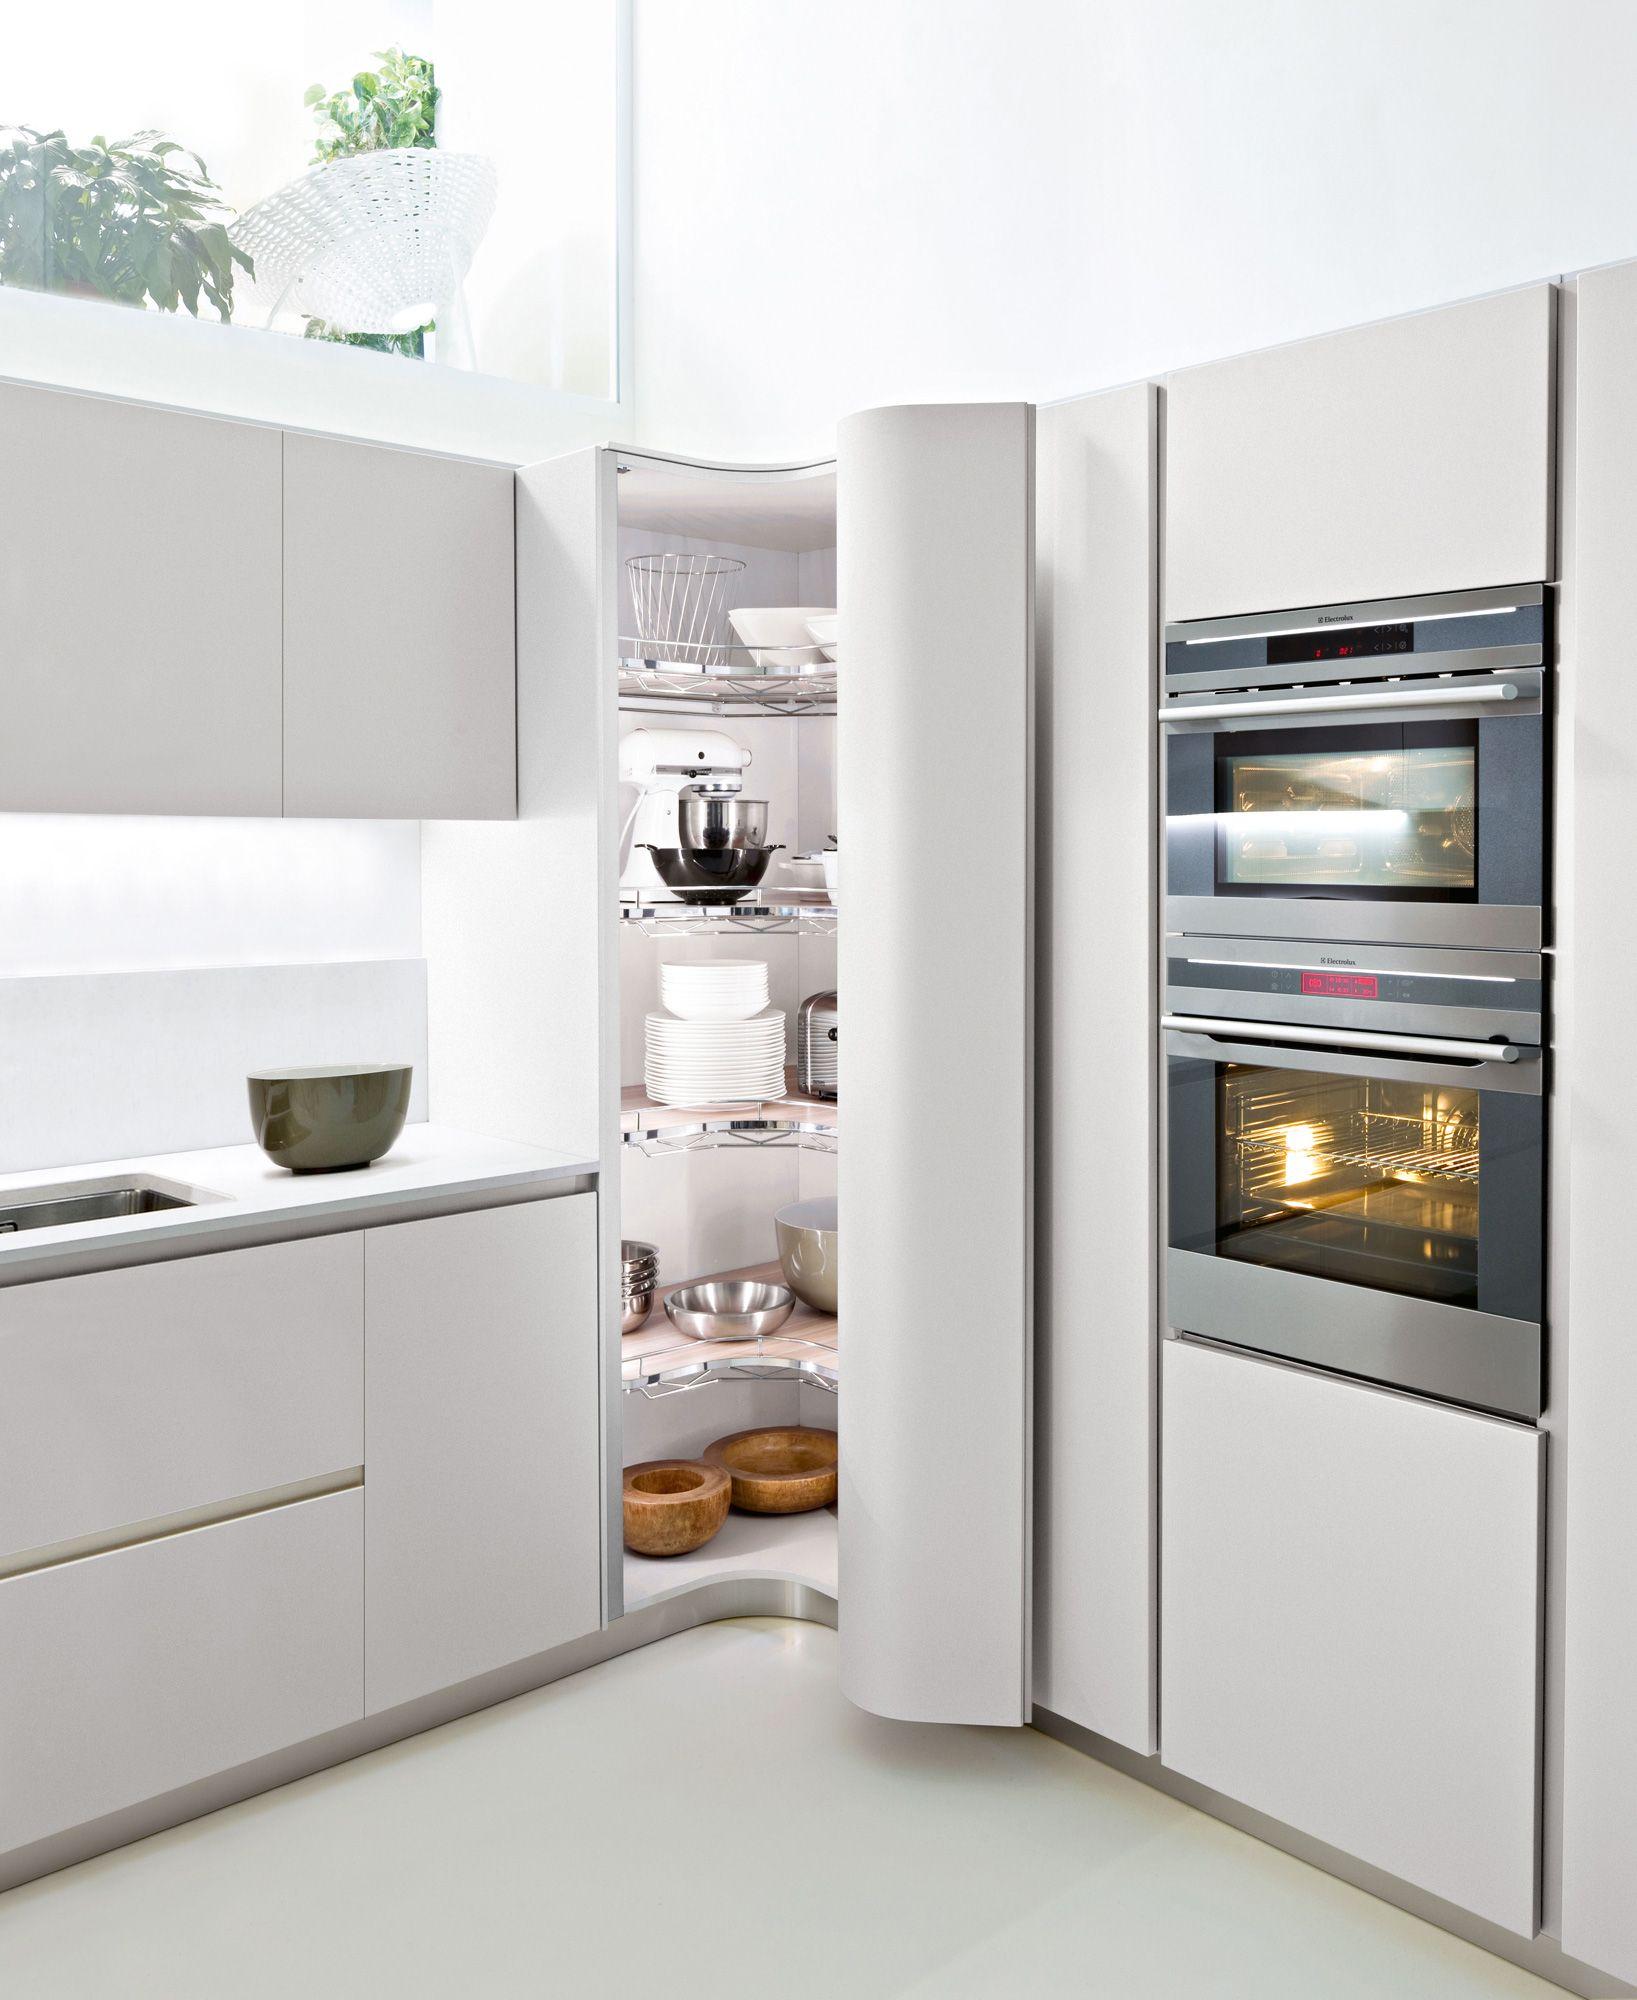 modern kitchens ola20 | Snaidero USA #kitchen #modern ...